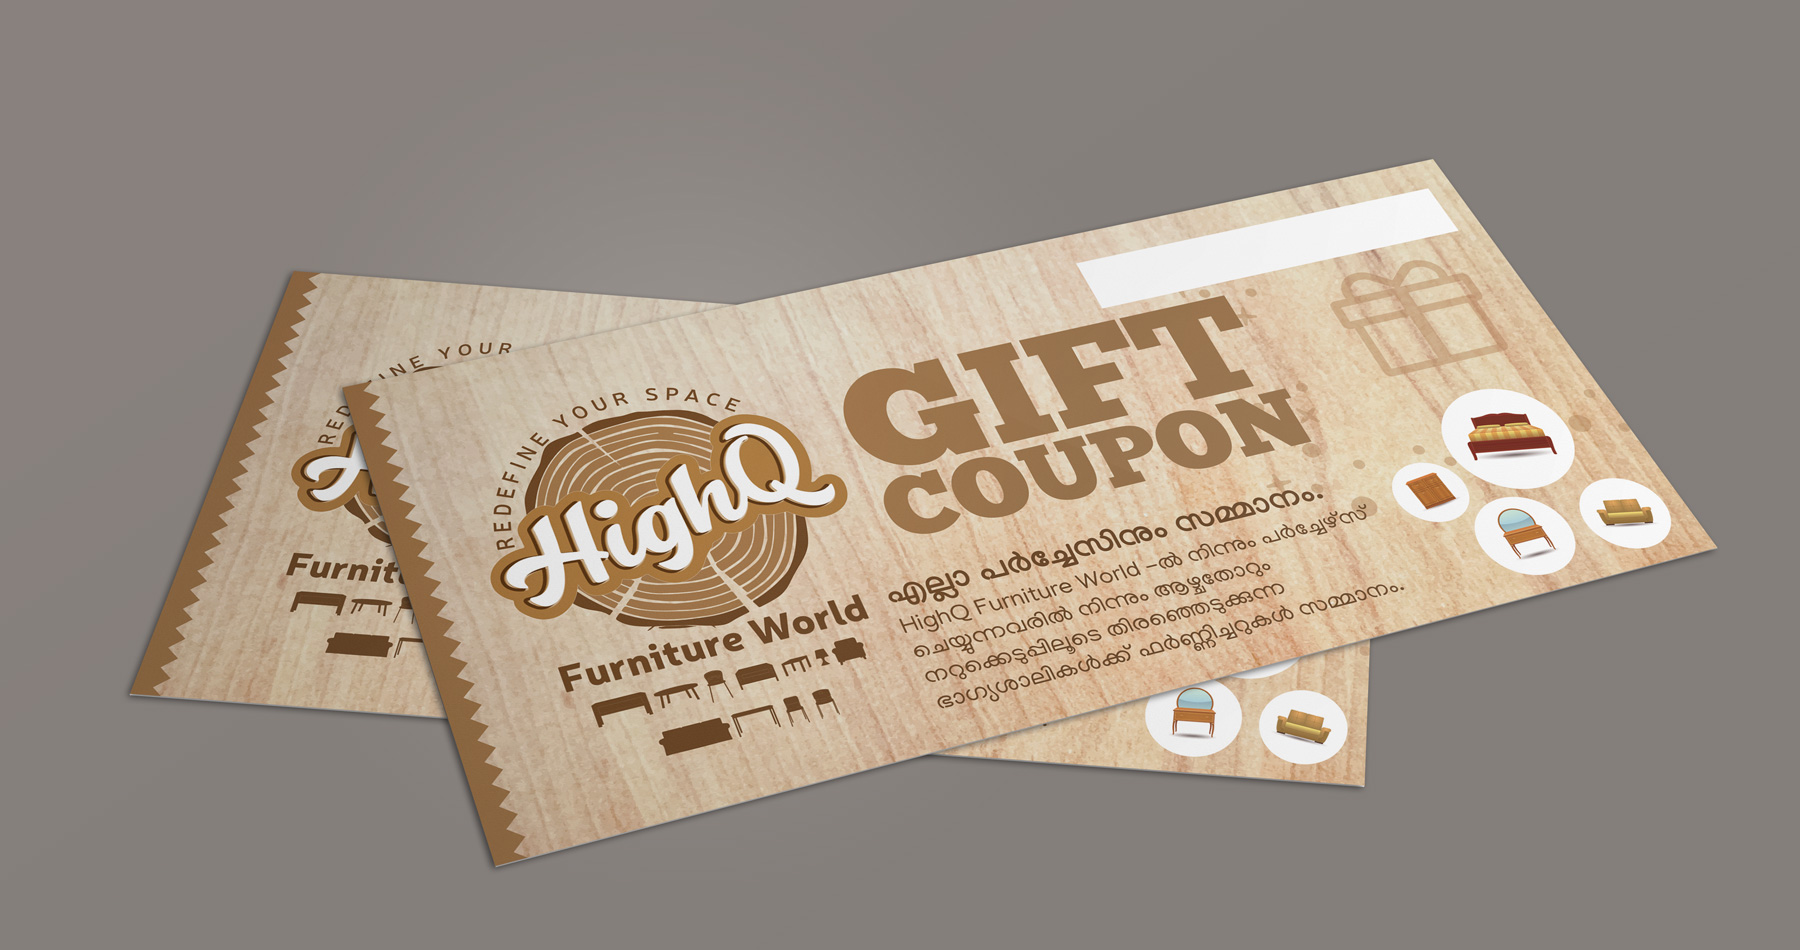 Gift coupon design